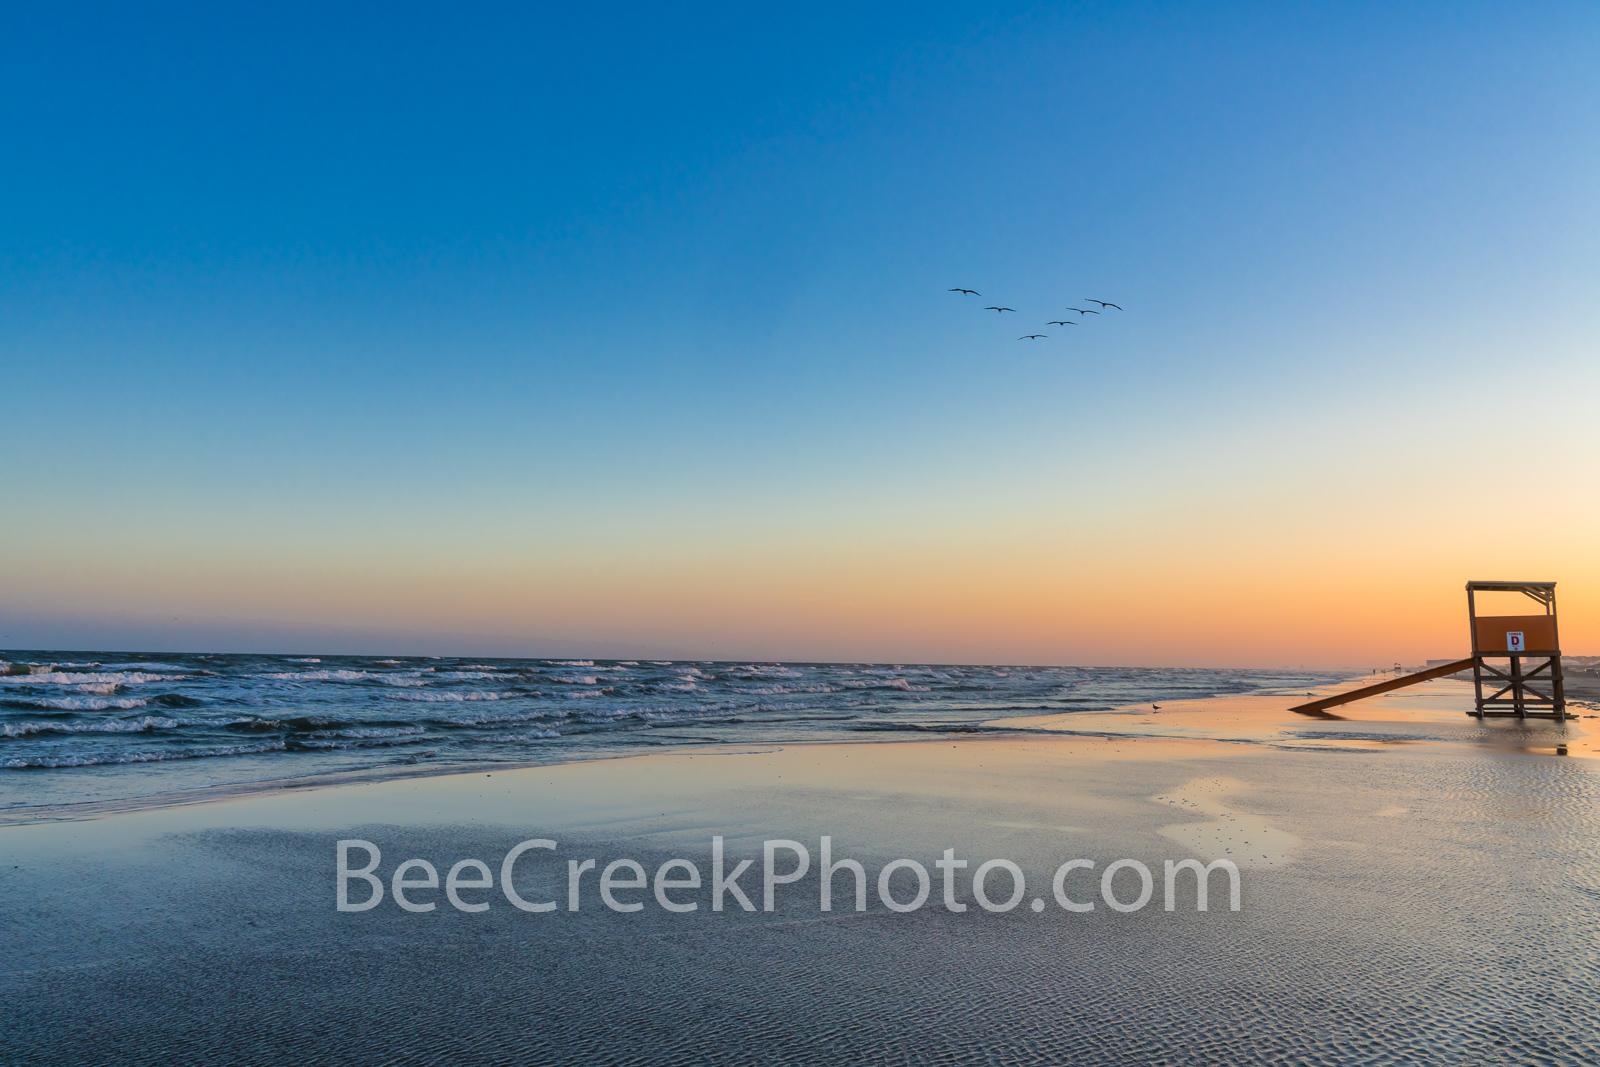 Tranquility at Dusk, Port Aransas Beach Texas Coast - This was the scene at Port Aransas beach at dusk or the blue hour which...